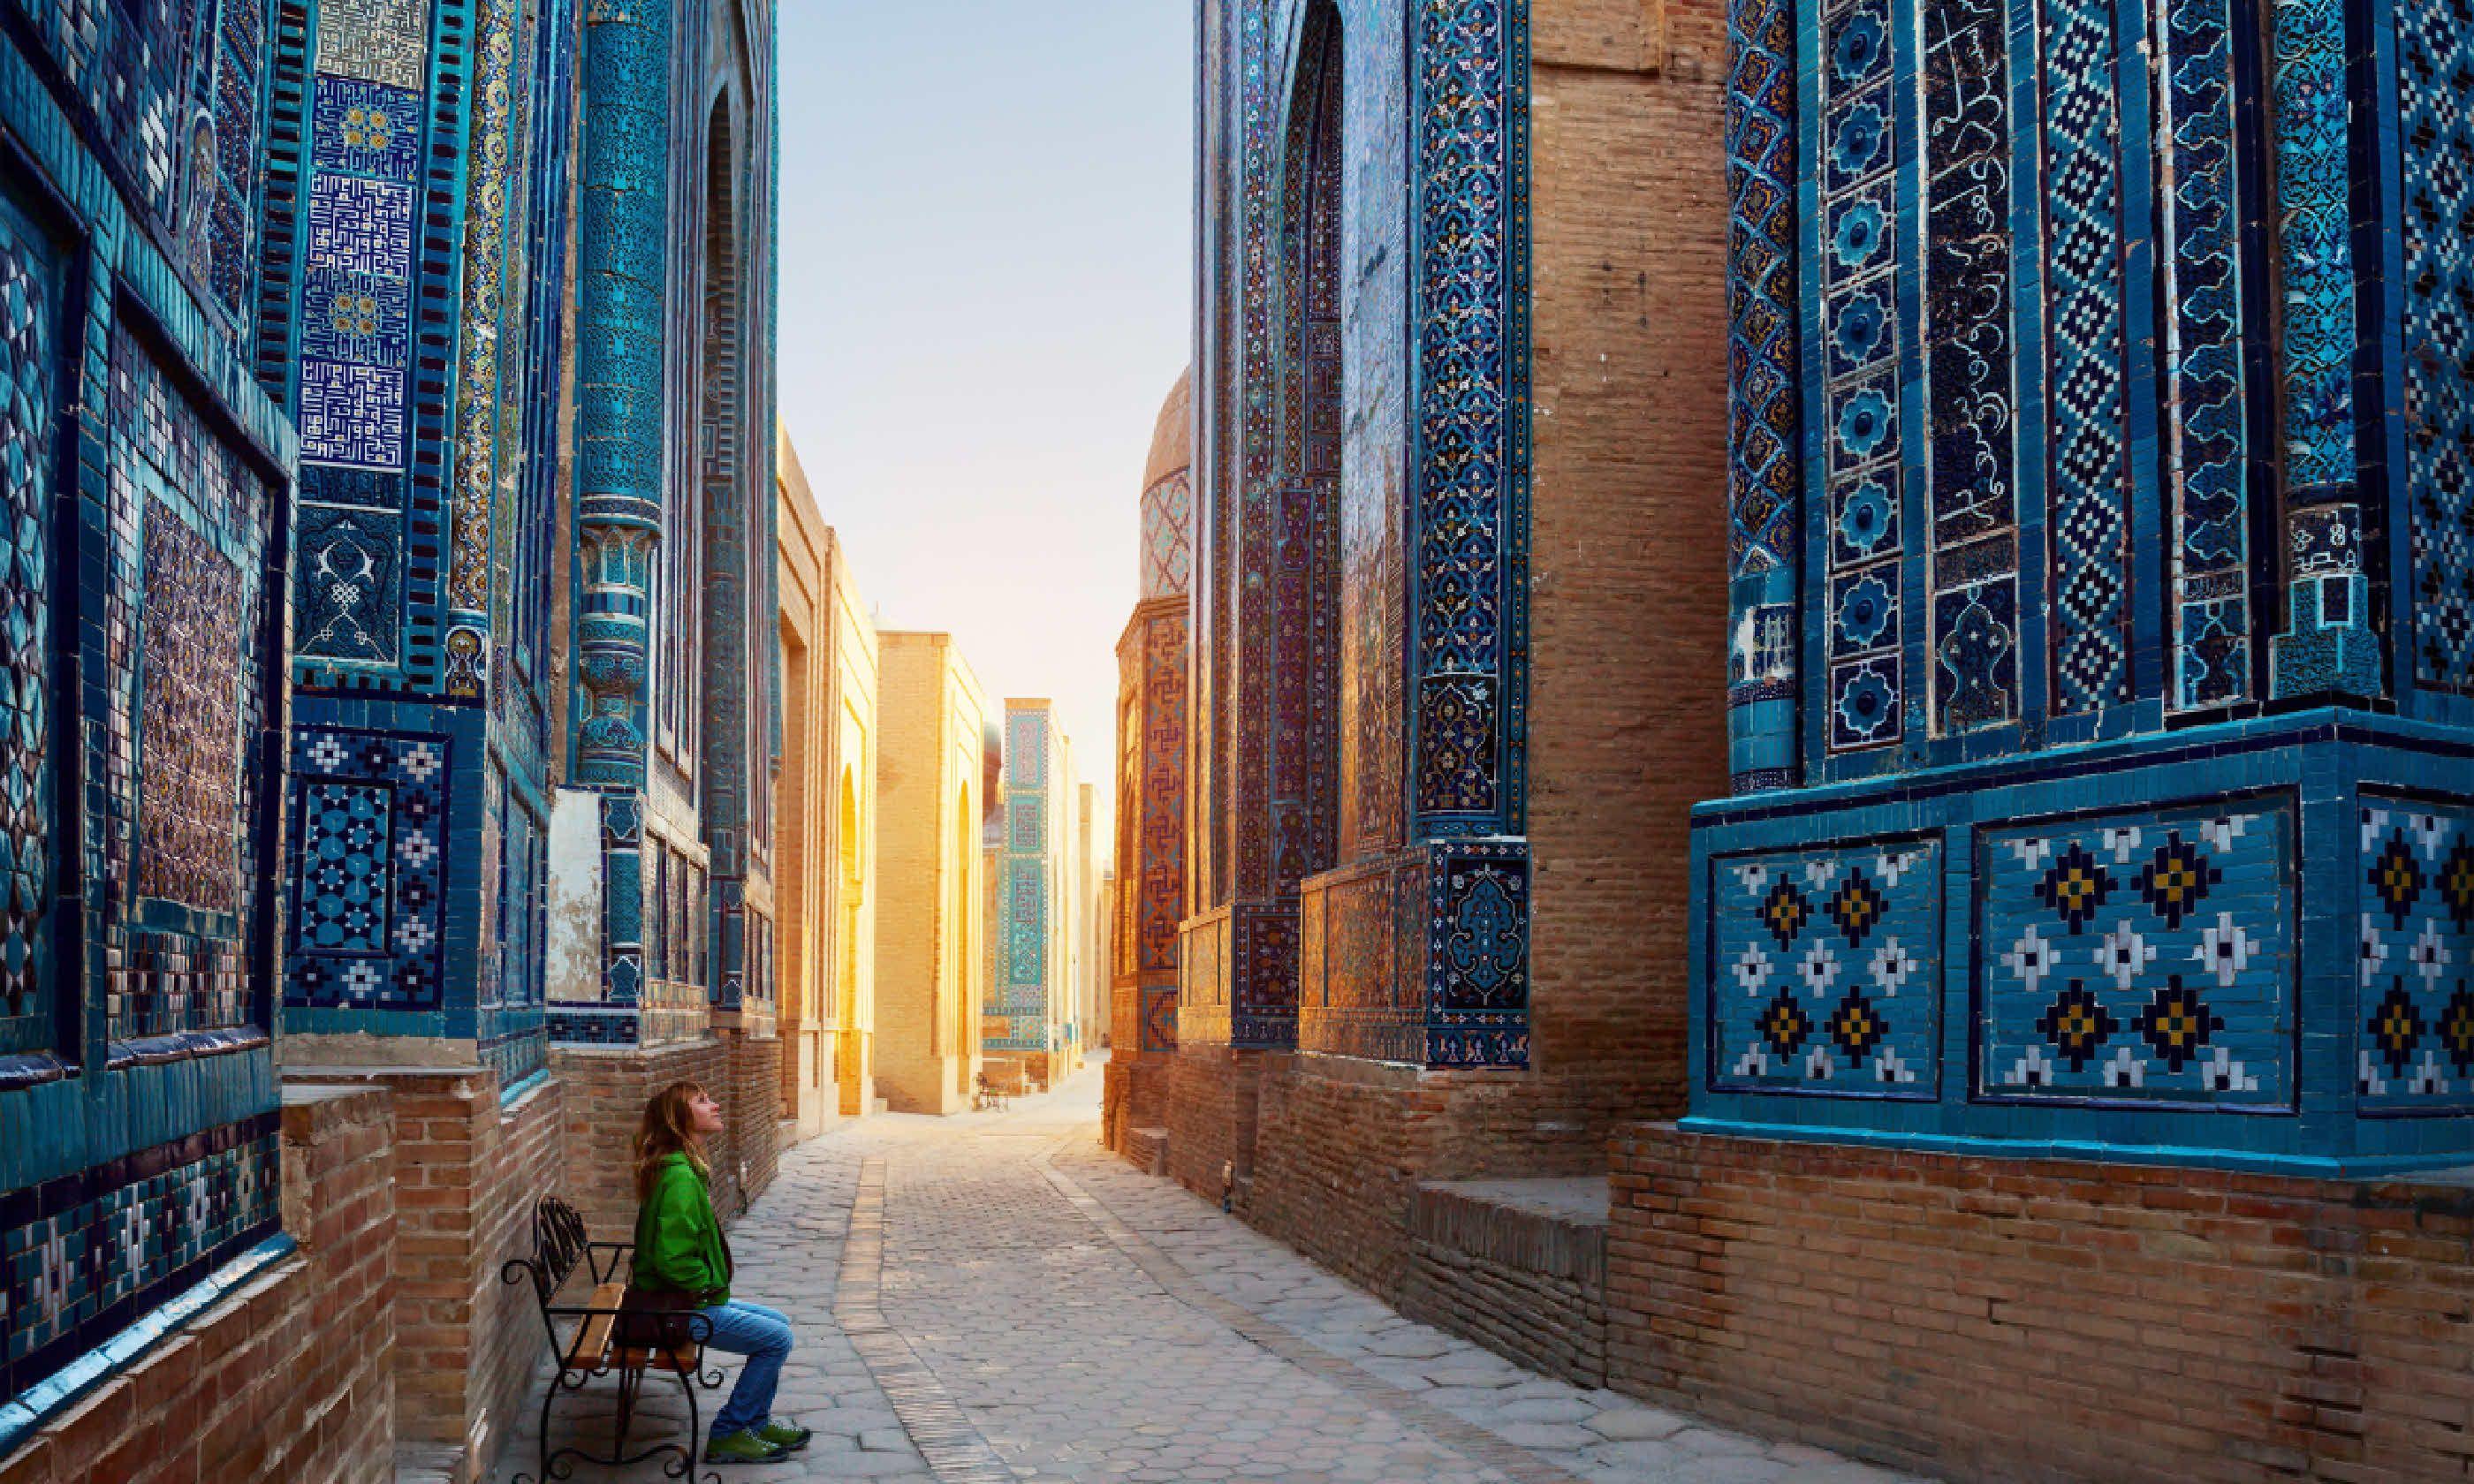 Ancient complex of Shah-i-Zinda, Samarkand (Shutterstock)